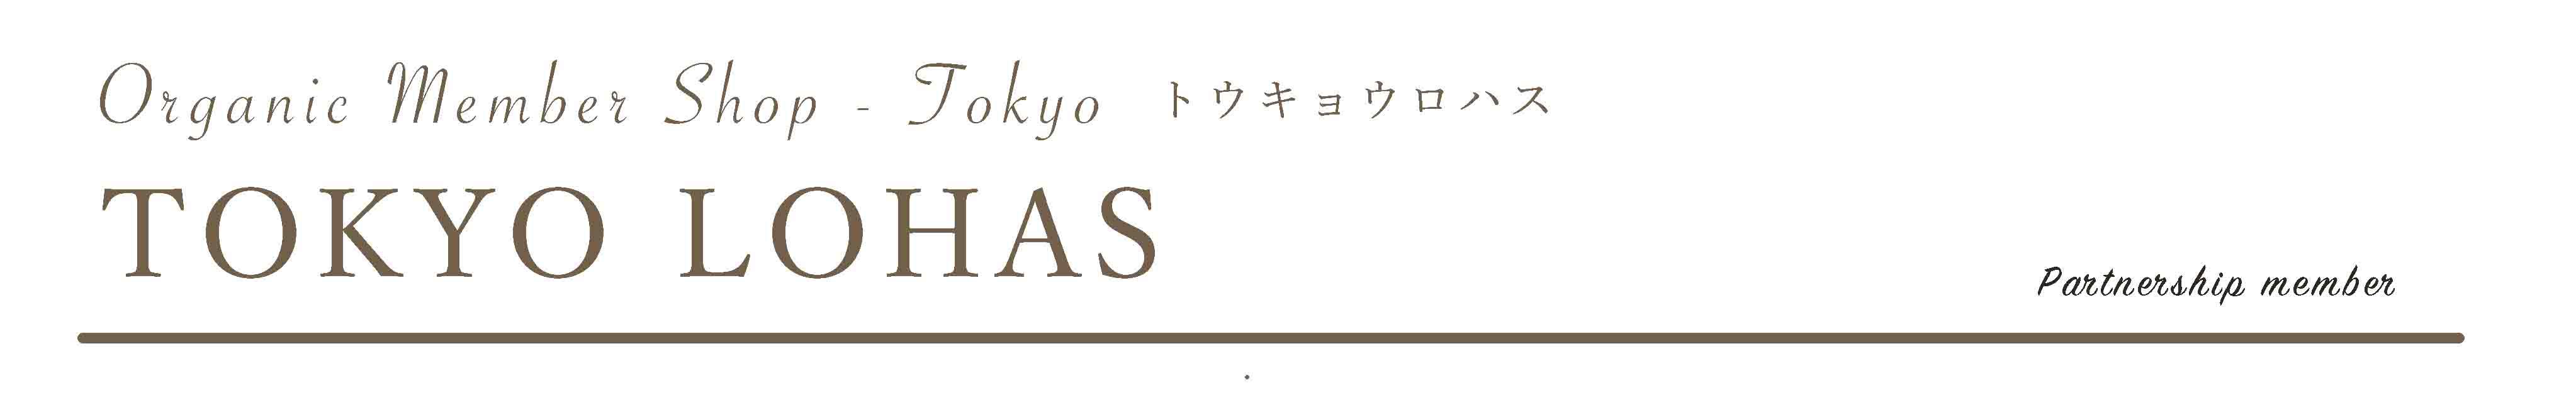 TOKYO LOHAS